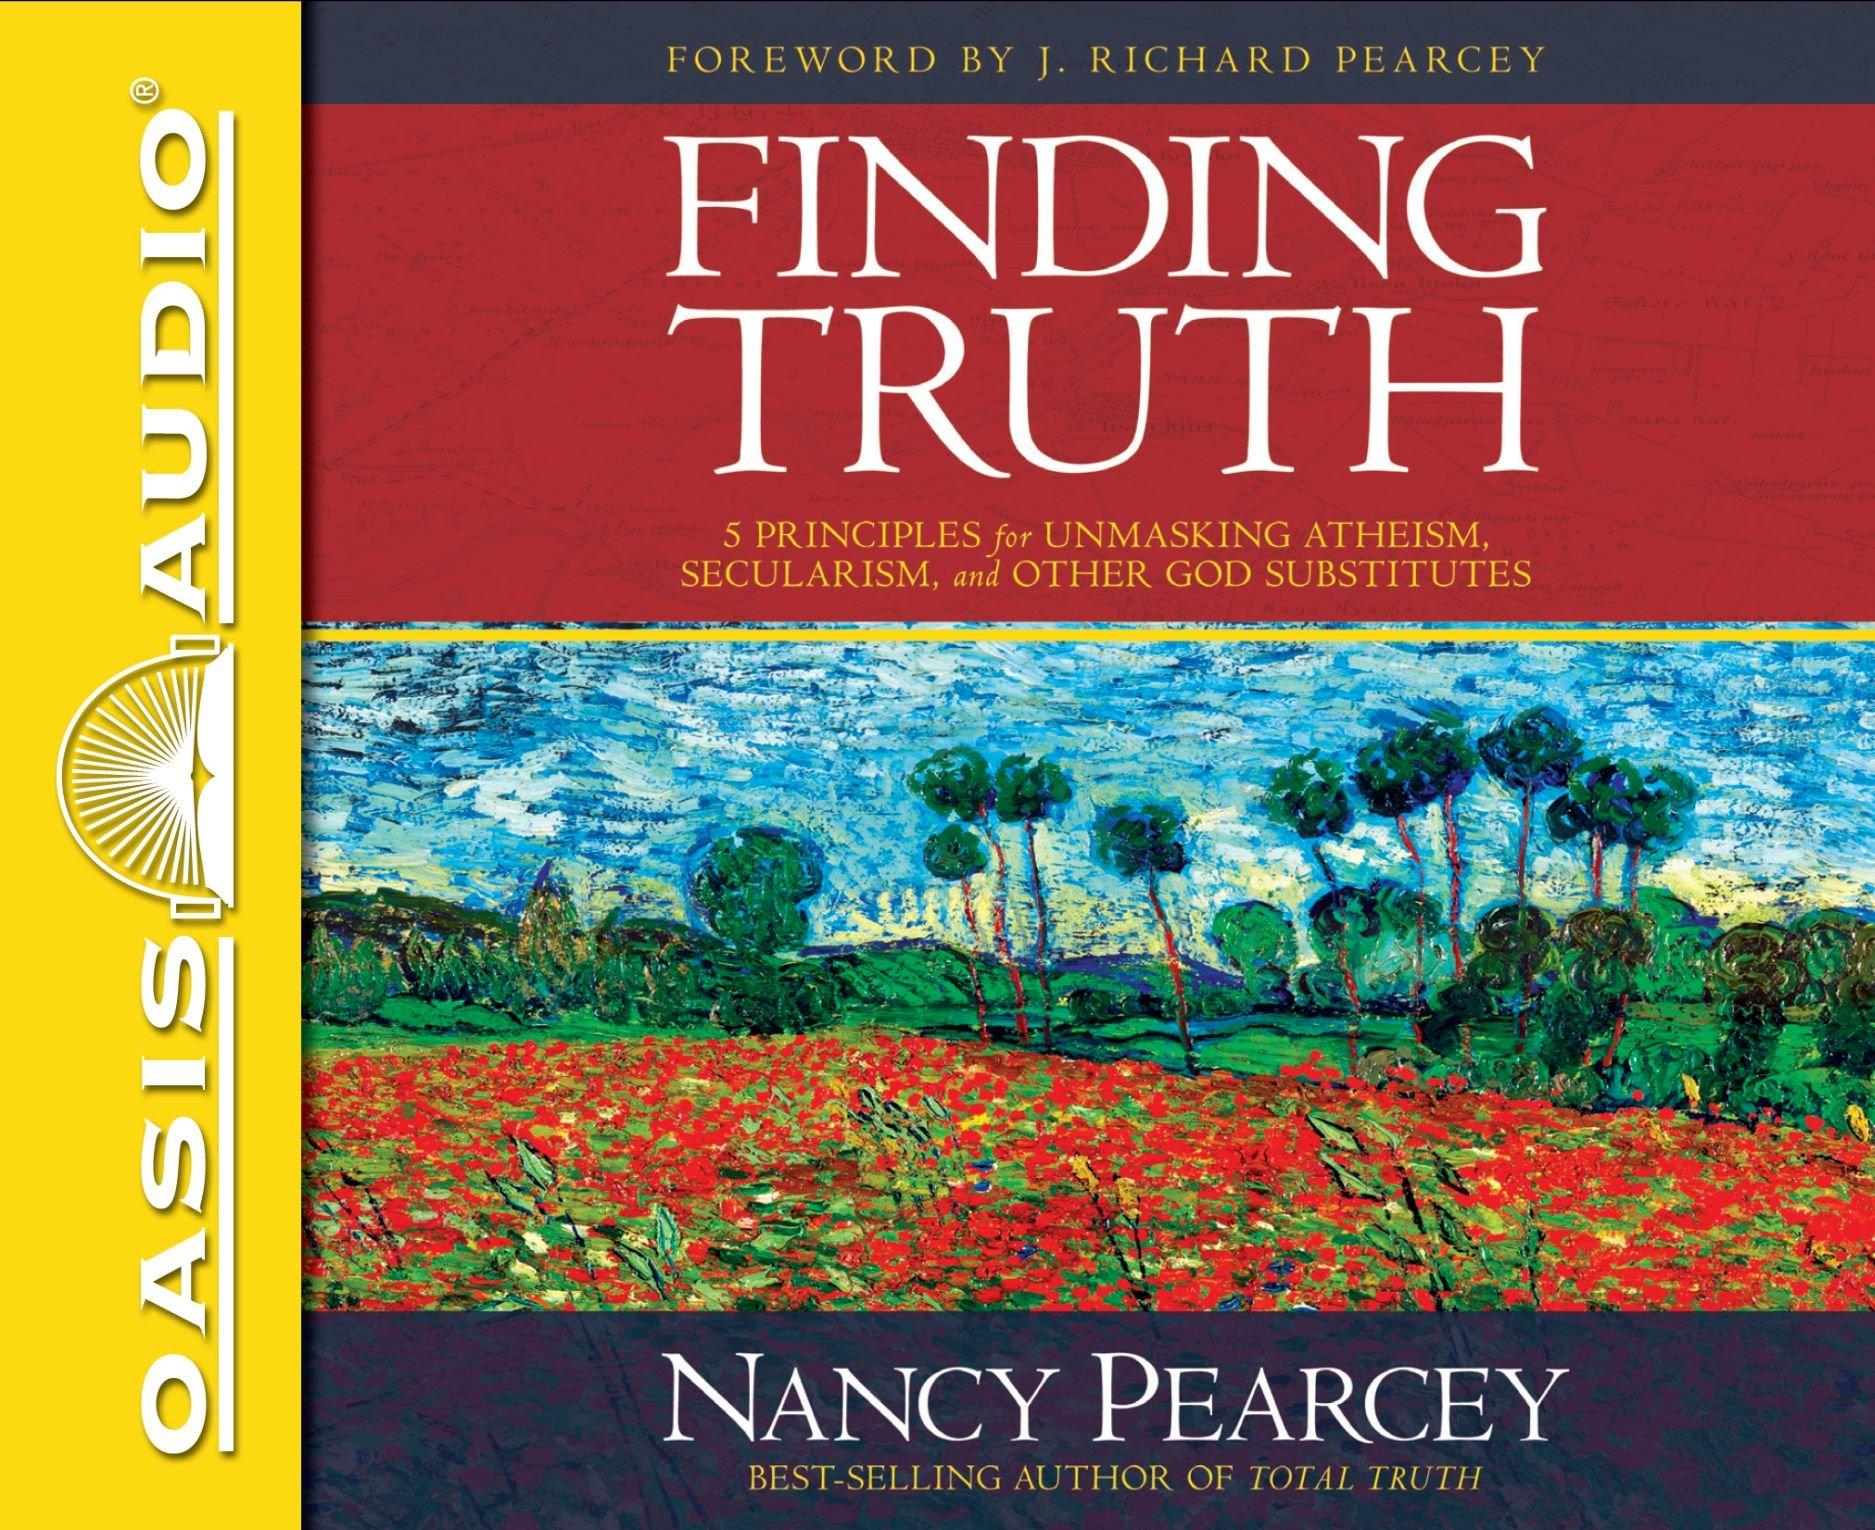 Finding Truth: 5 Principles for Unmasking Atheism, Secularism, and Other God Substitutes: Amazon.es: Pearcey, Nancy, Klein, Pamela: Libros en idiomas extranjeros